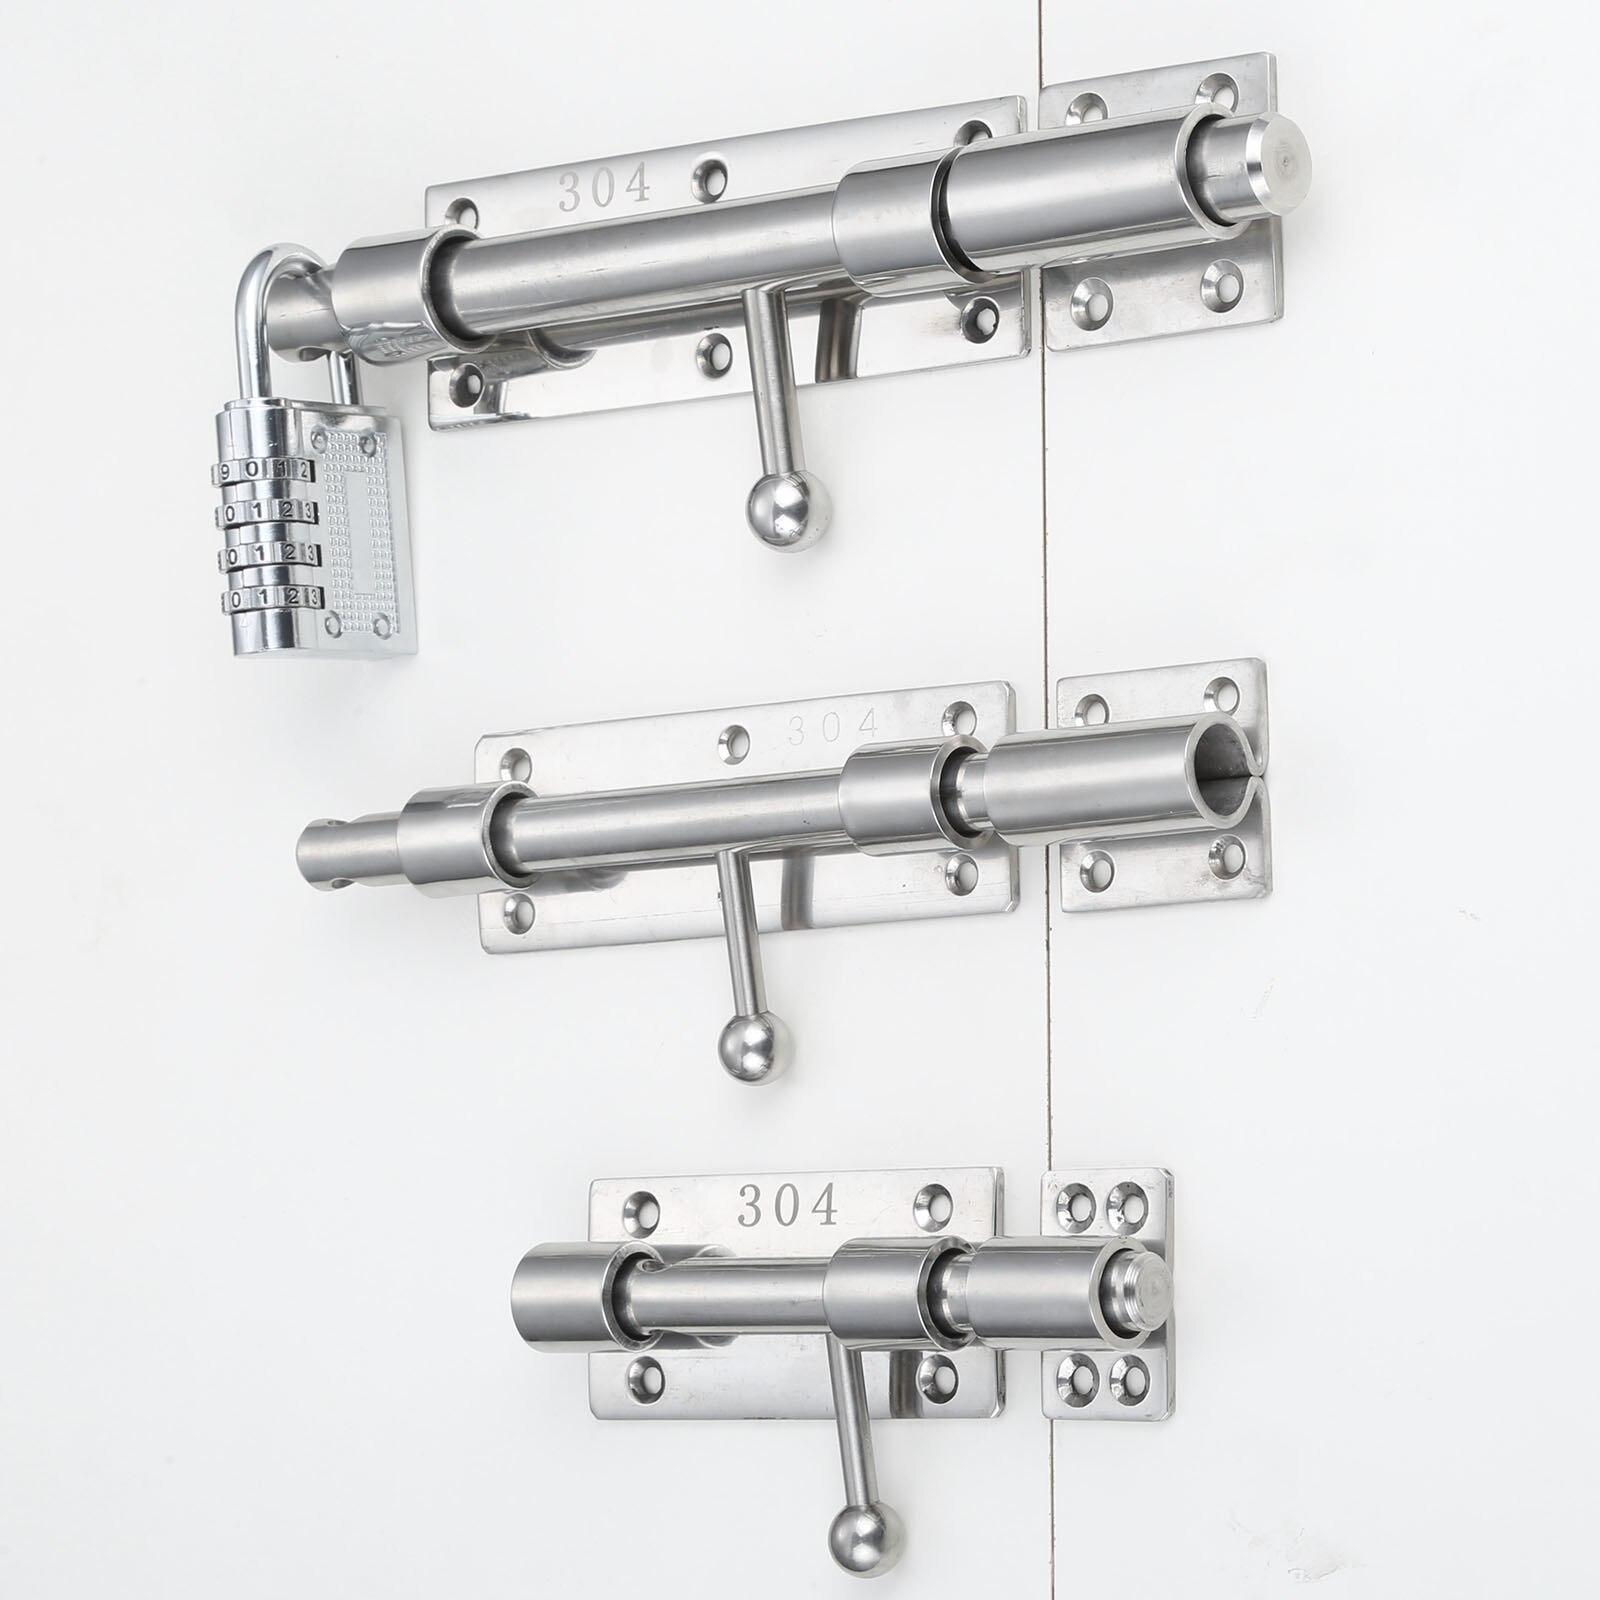 Slide Bolt Latch Lock Solid Heavy Duty Security Barrel Latch Hasp Pin with Screws for Fence Window Gate Interior Barn Door